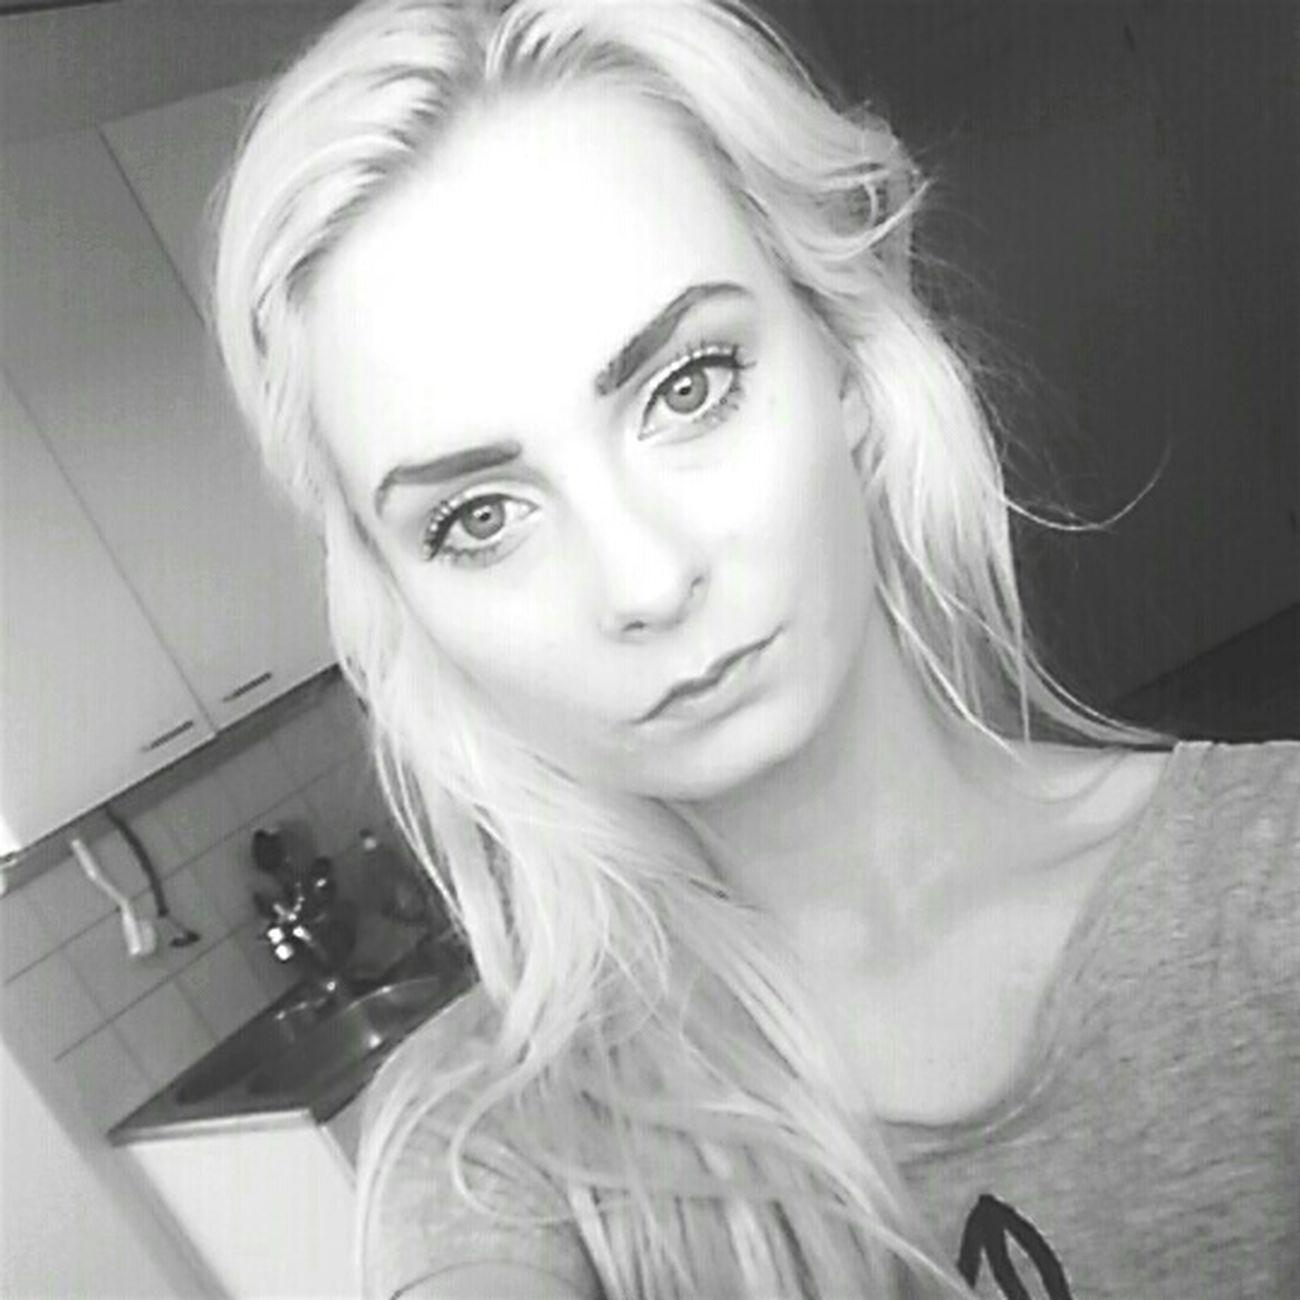 Morning Makeupoftheday Blondehairdontcare